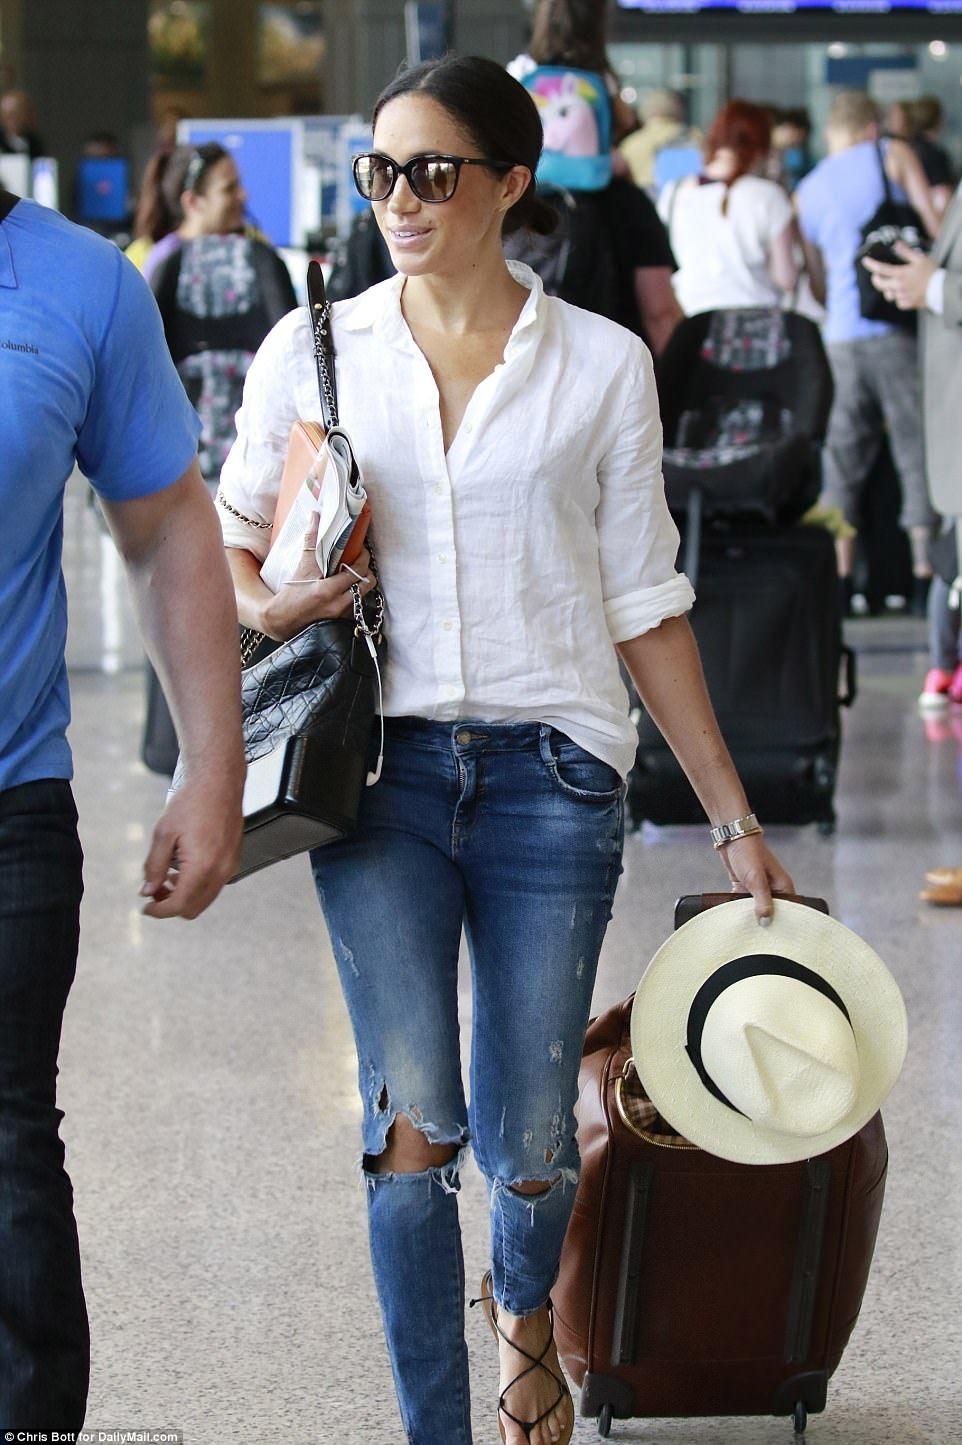 a41ac1246 Meghan Markle.. J. Crew shirt, Zara jeans, J. Crew sandals and sunglasses,  Chanel Gabrielle handbag, Madewell panama hat, Jennifer Meyer 18k white  gold ...